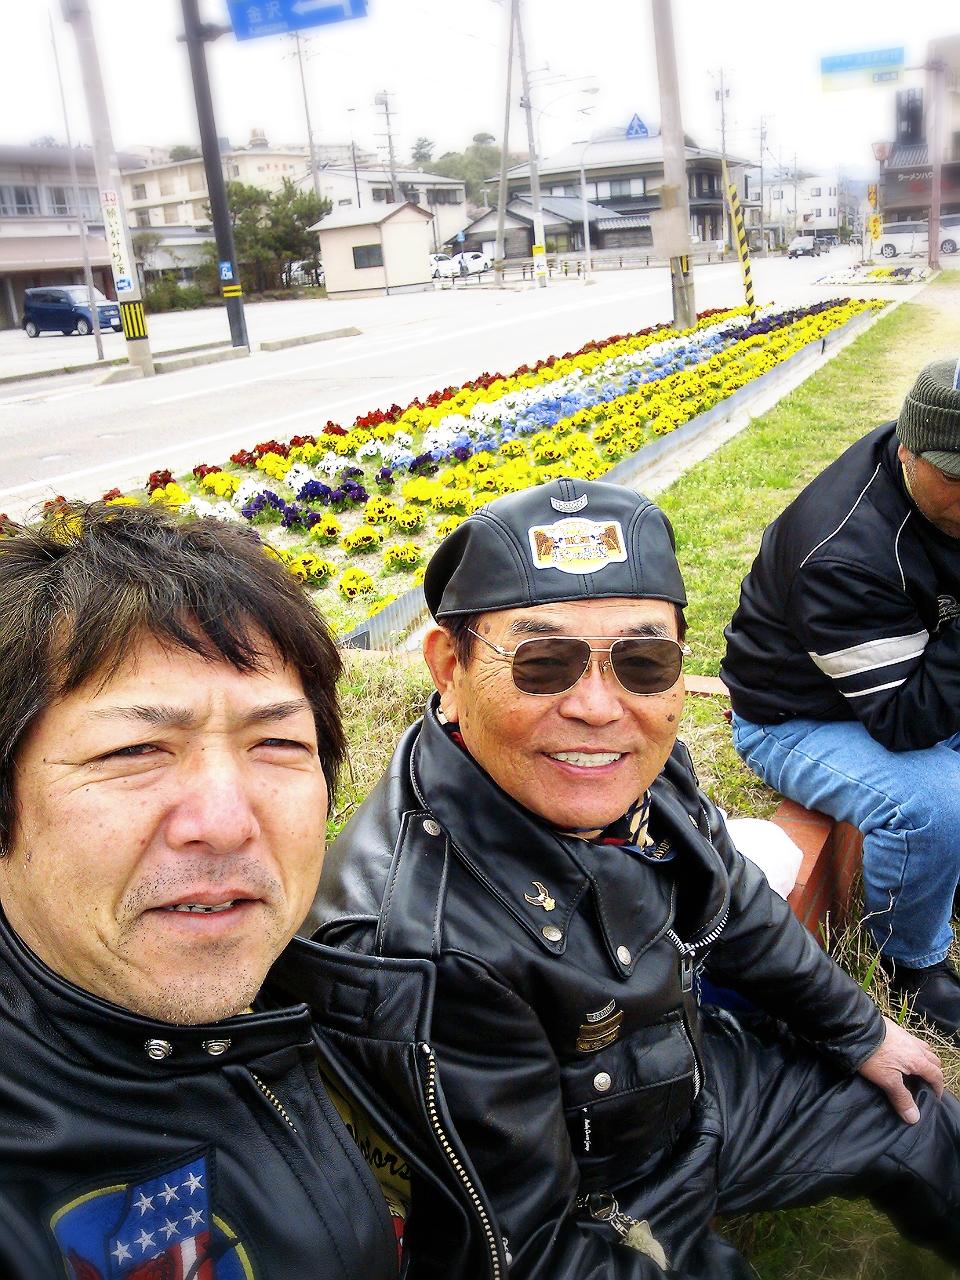 2014-04-20-12-42-29_deco.jpg